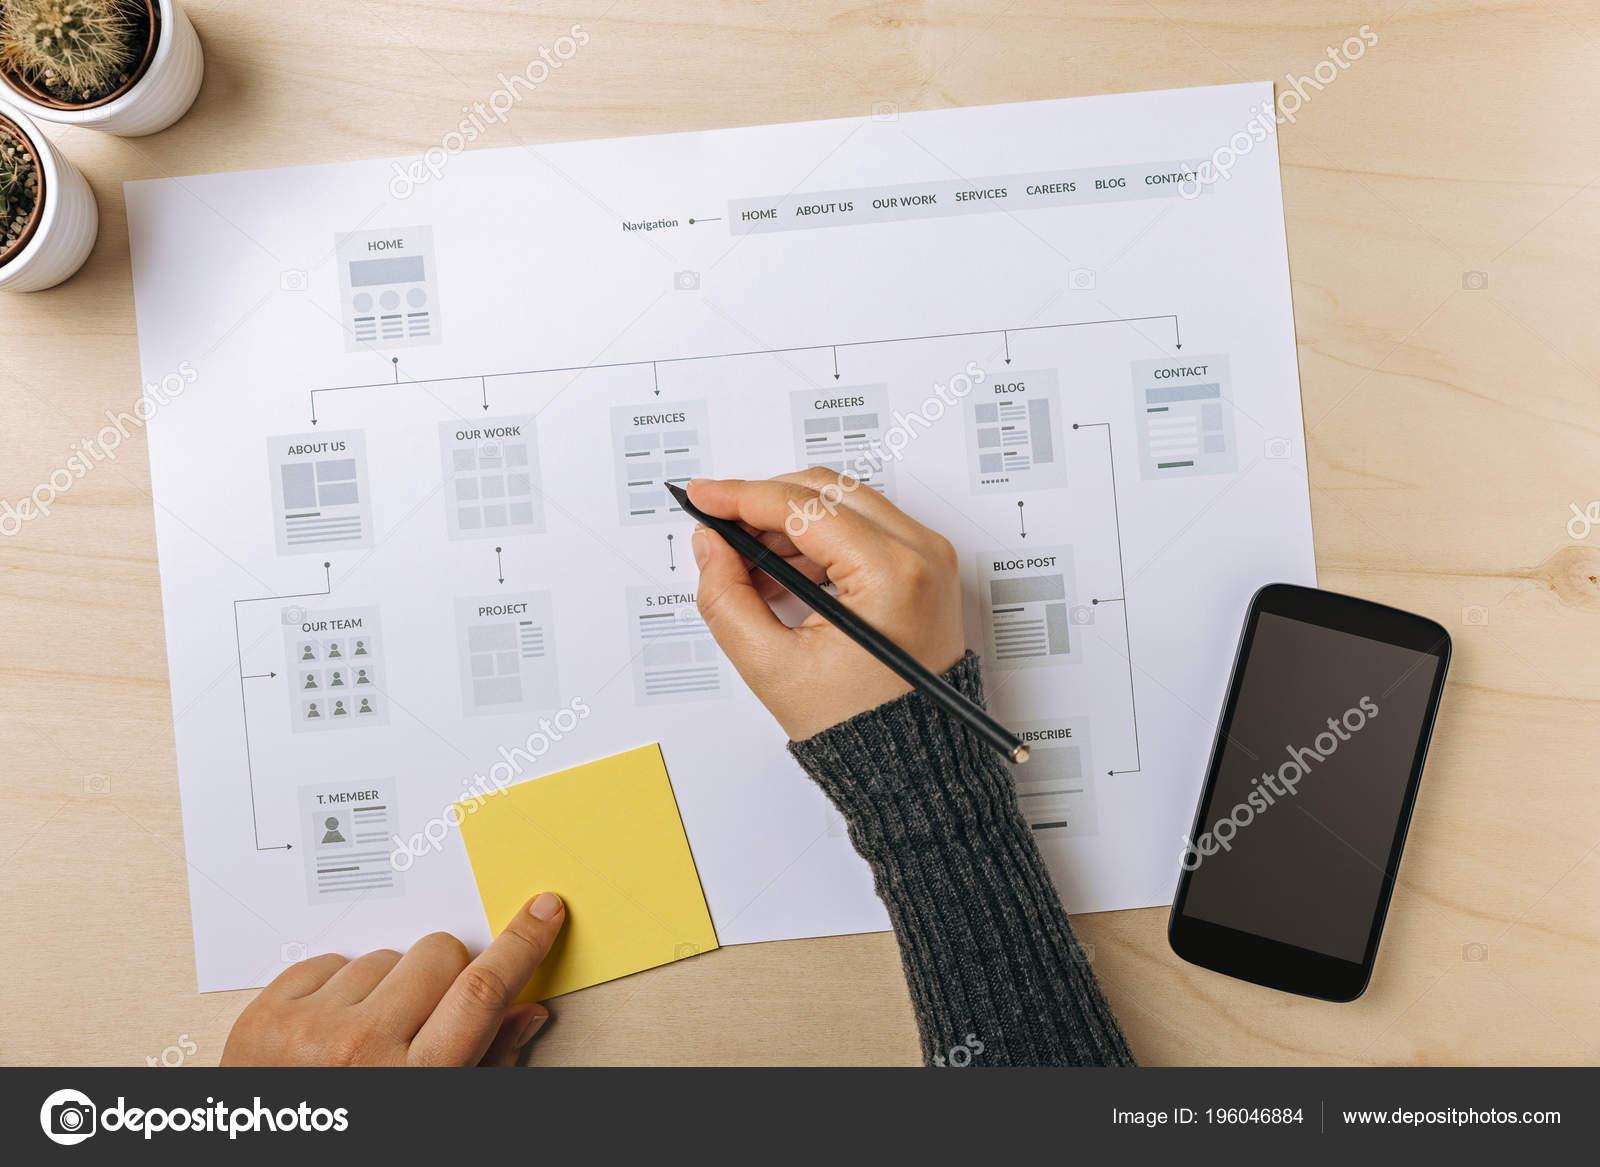 696d60787132 Веб-дизайнер работает на веб-сайте Карта сайта. Заложить квартиру — Фото  автора carmenmsaa